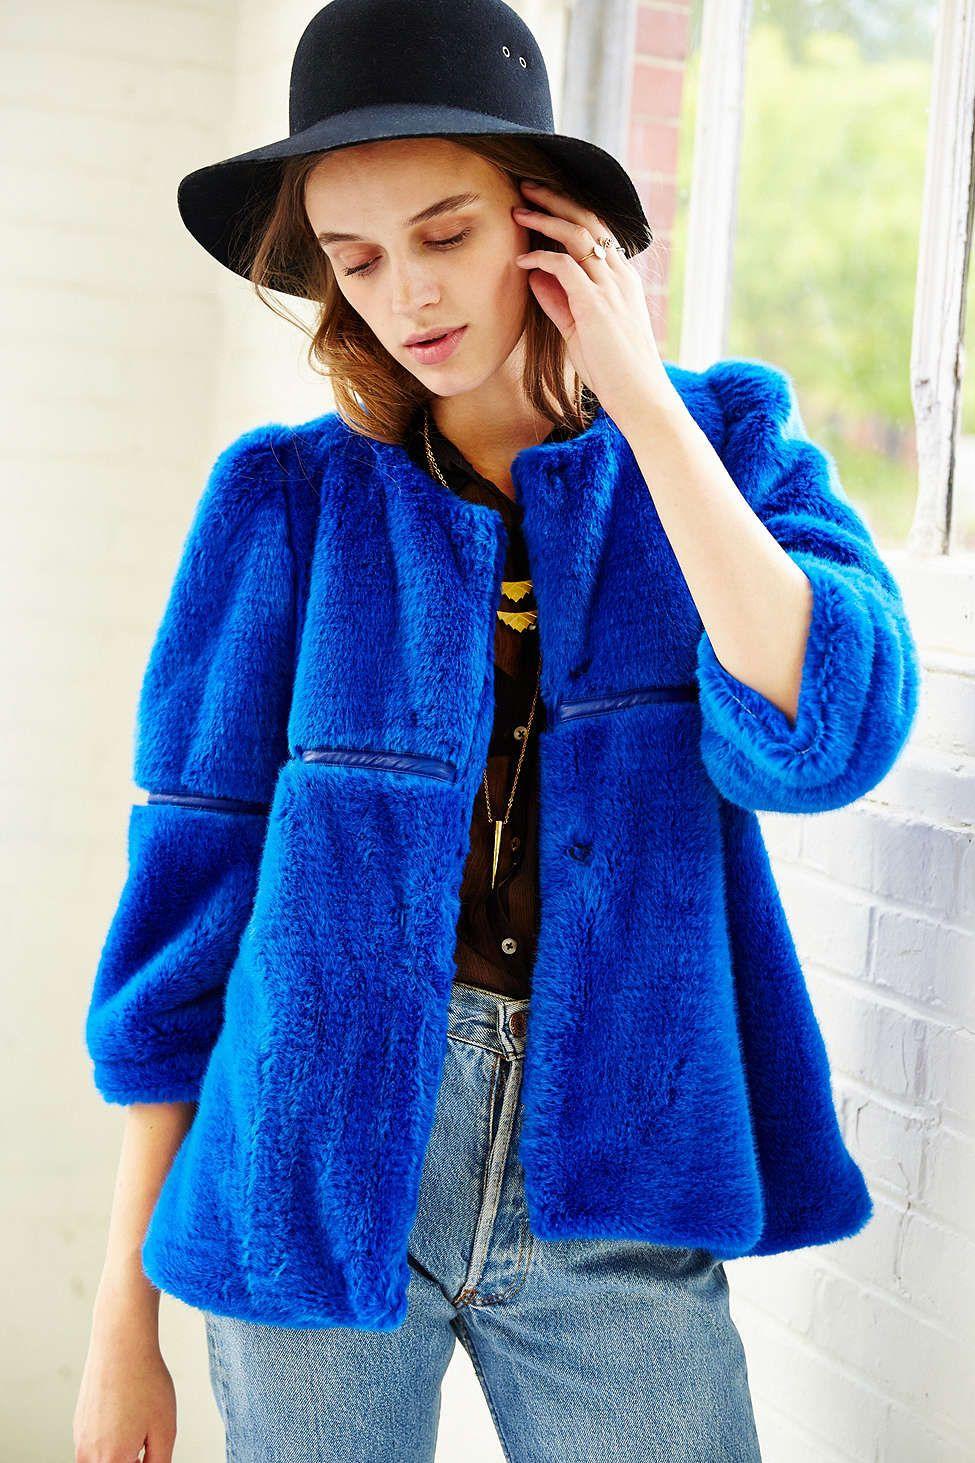 12 Glamorous Faux Fur Coats You Need This Season Blue Fur Coat Cropped Coat Faux Fur Coat